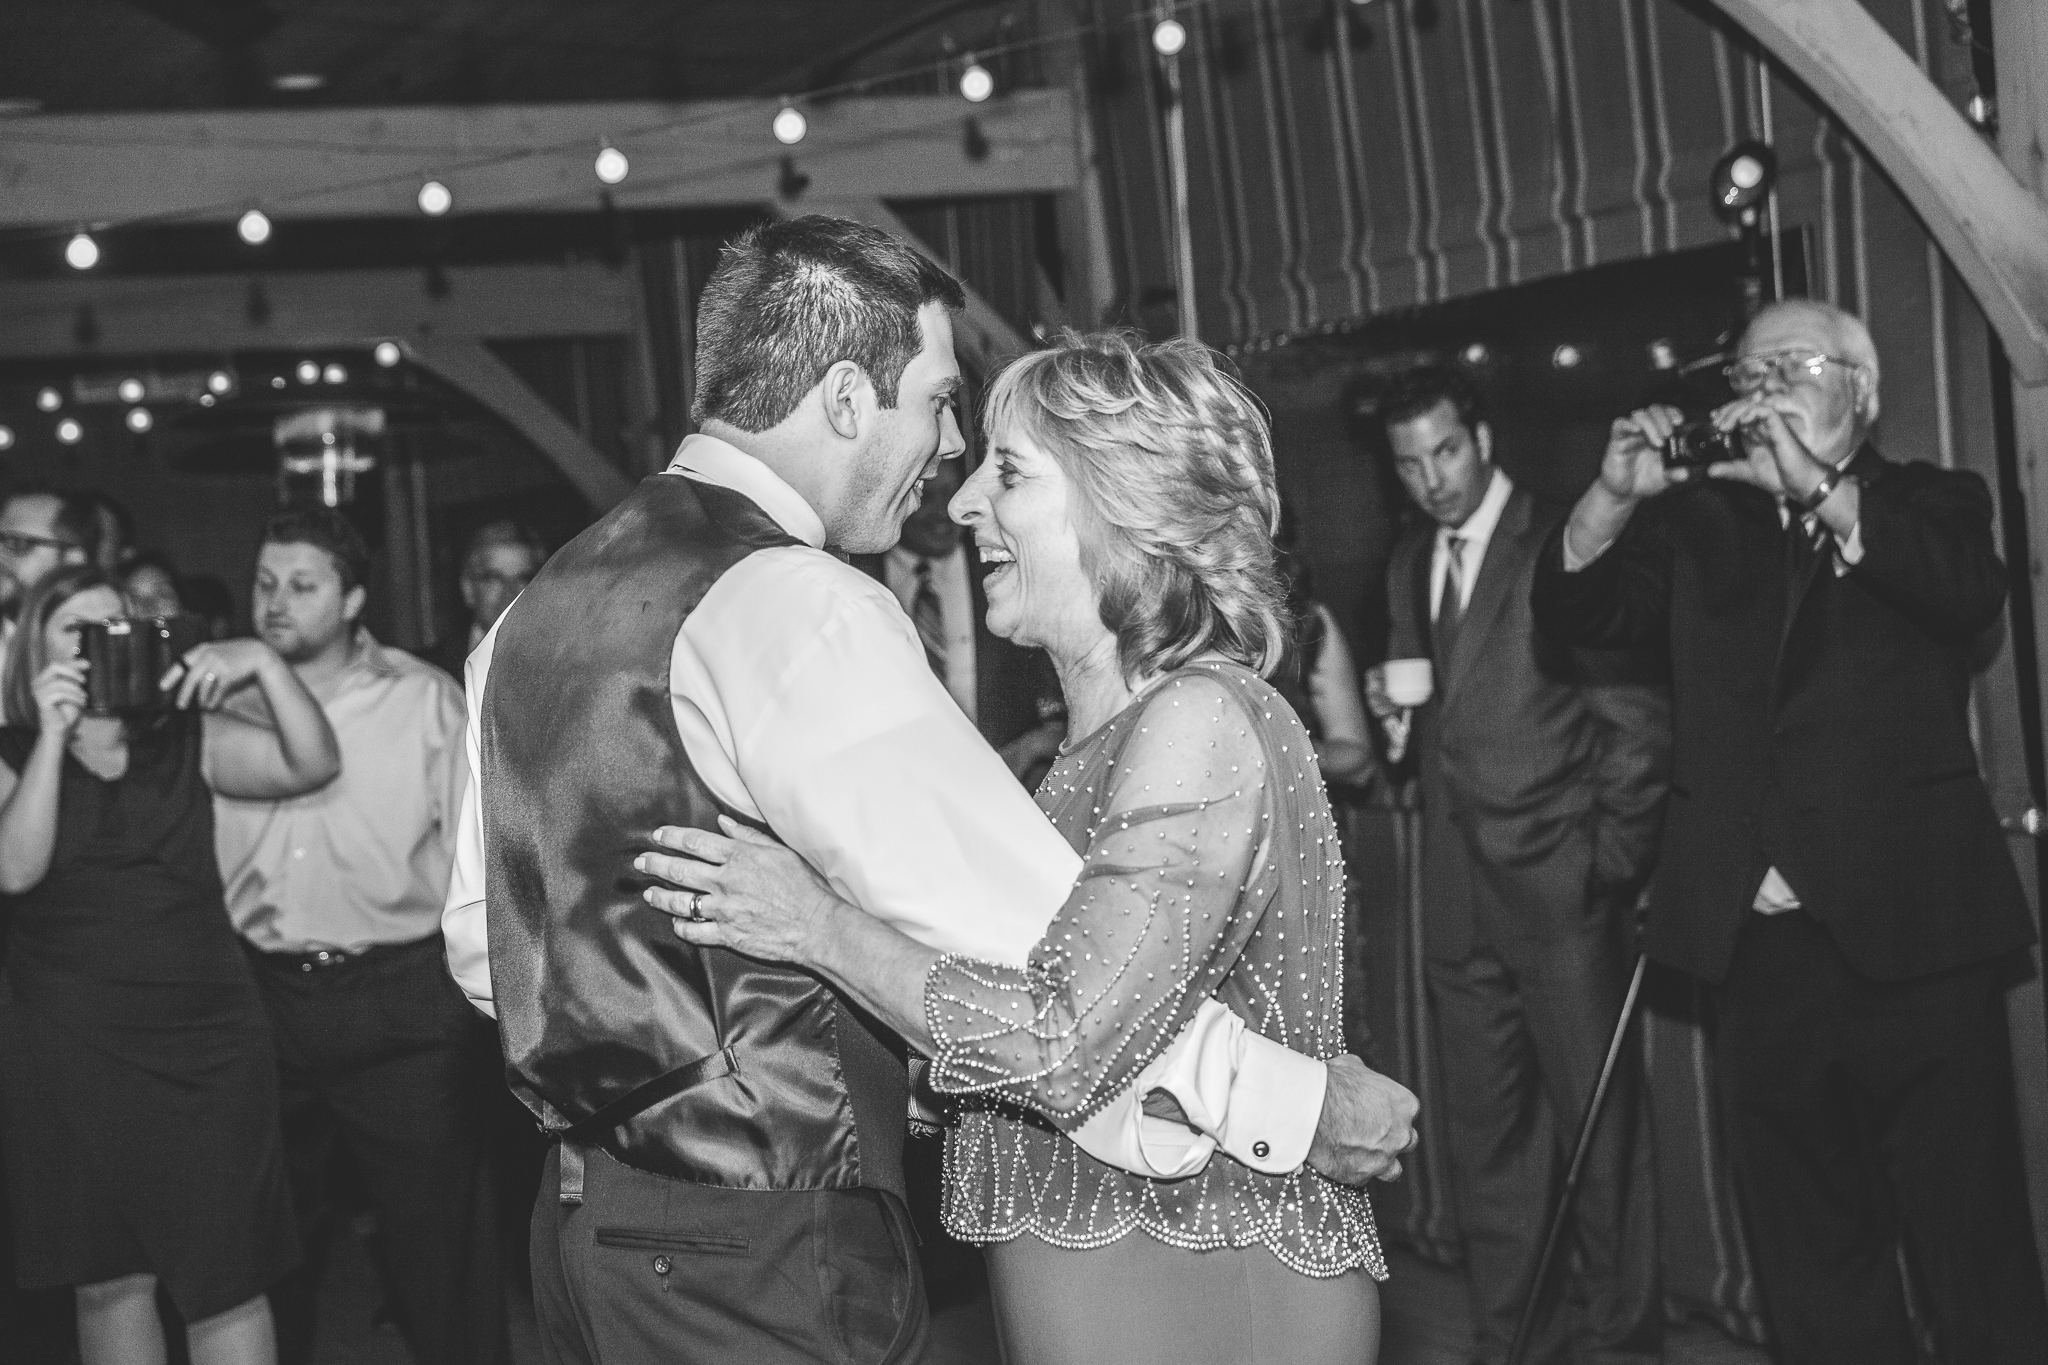 camuglia-whomstudio-chelsea_and_andy-nycphotographer-wedding-brooklyn-buffalo-timberlodge-128-0796.jpg